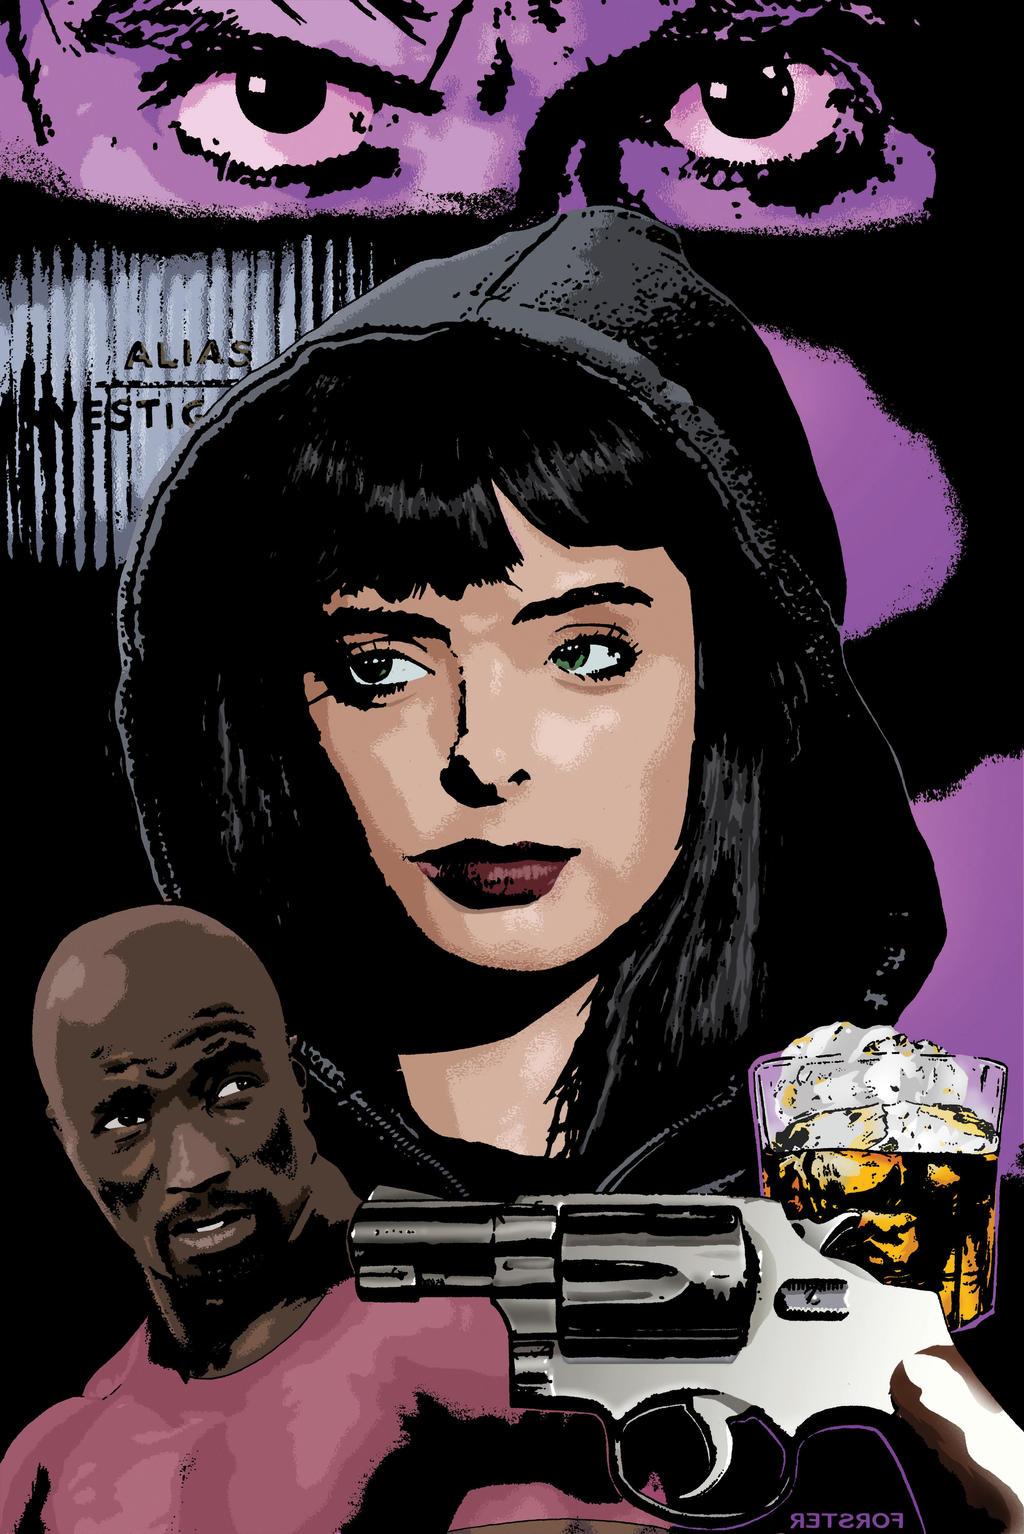 Guns, Booze and Jessica Jones by BillForster